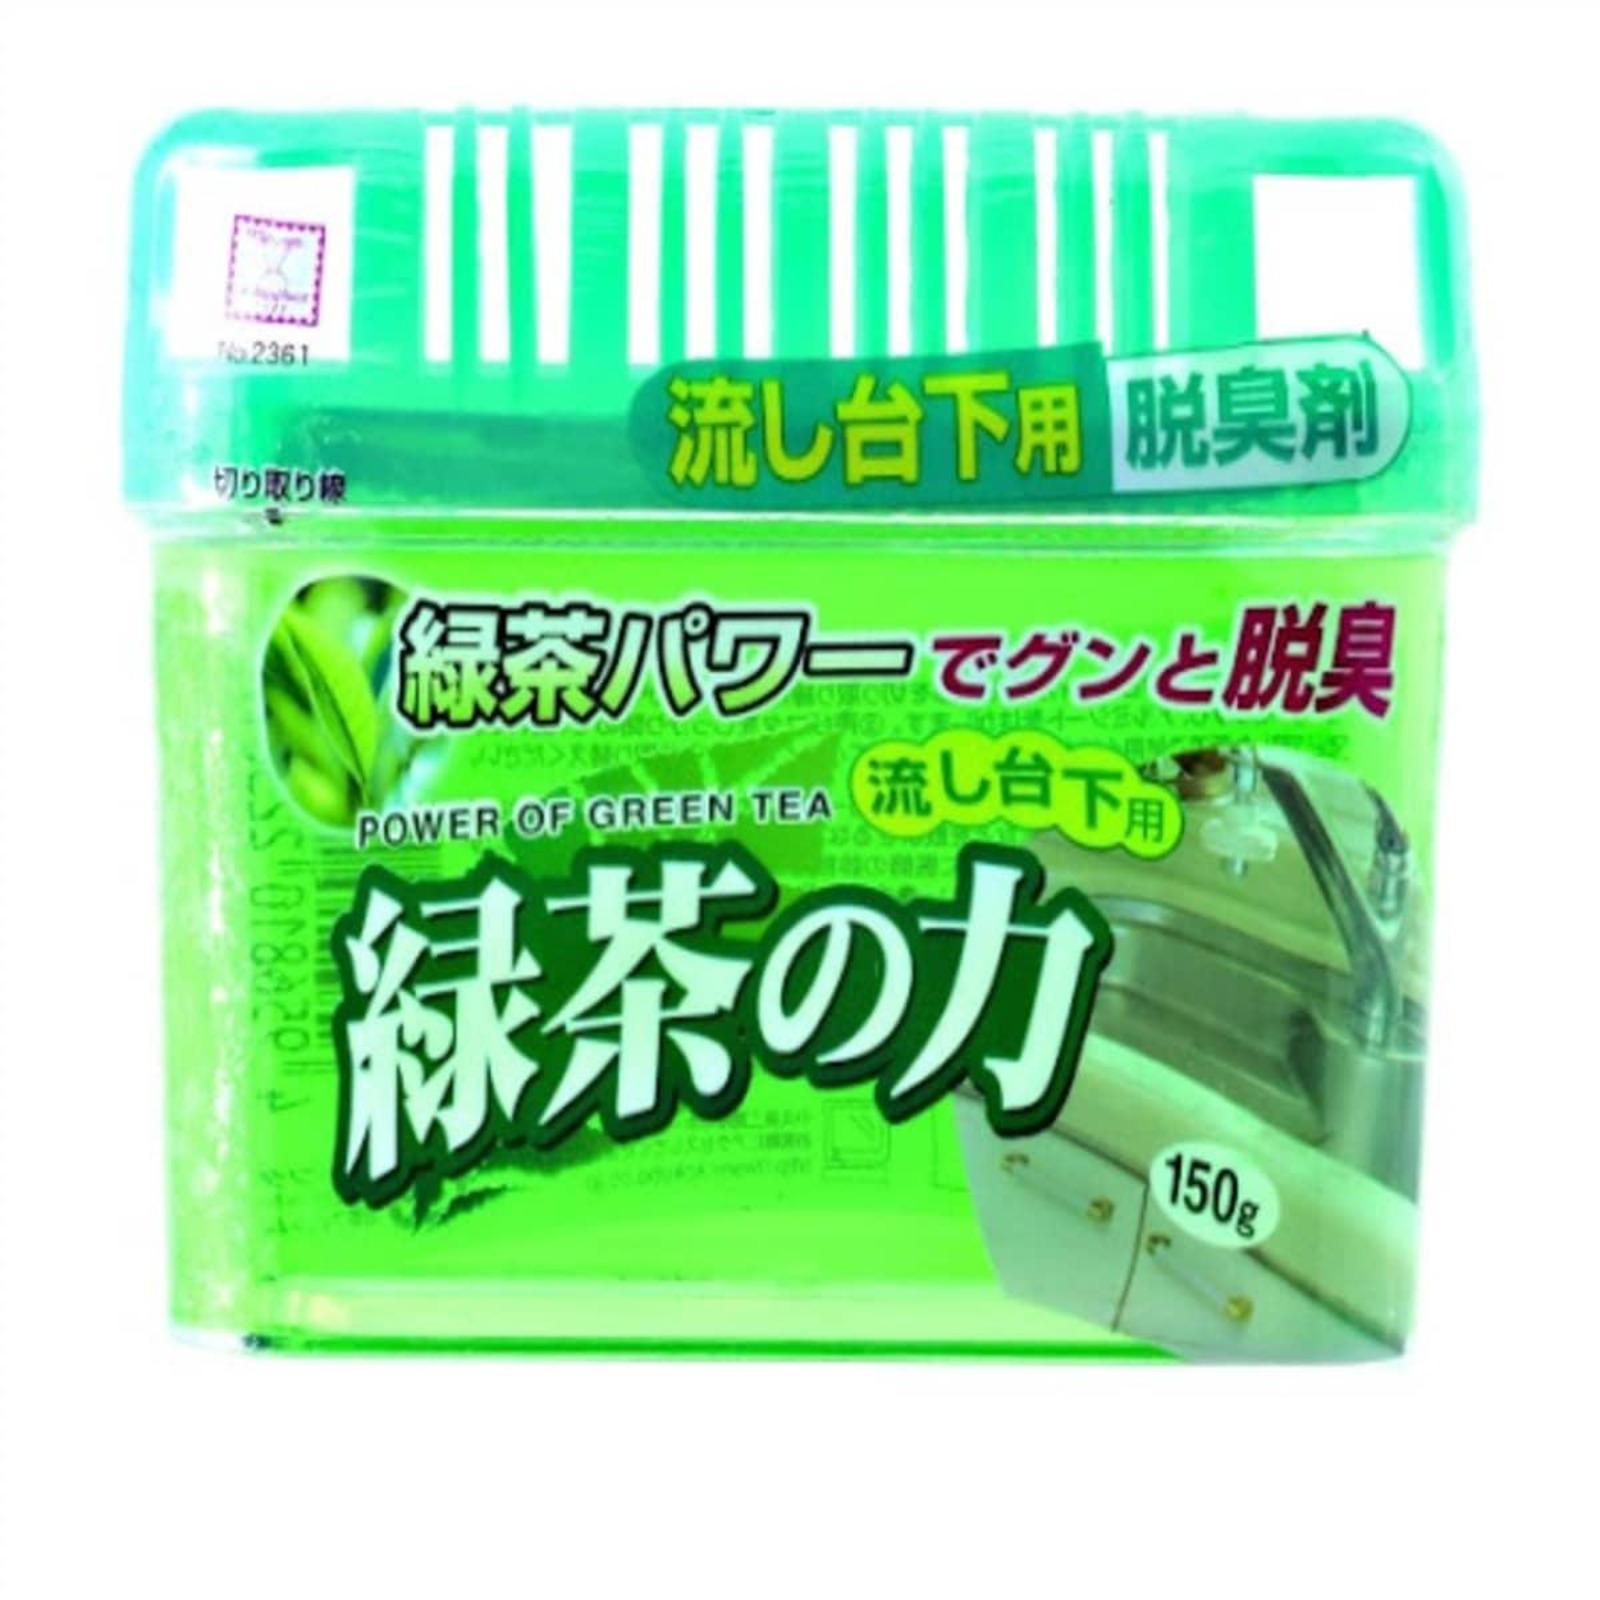 Kokubo Japan Sink Deodarant Green Tea Scent Japanese